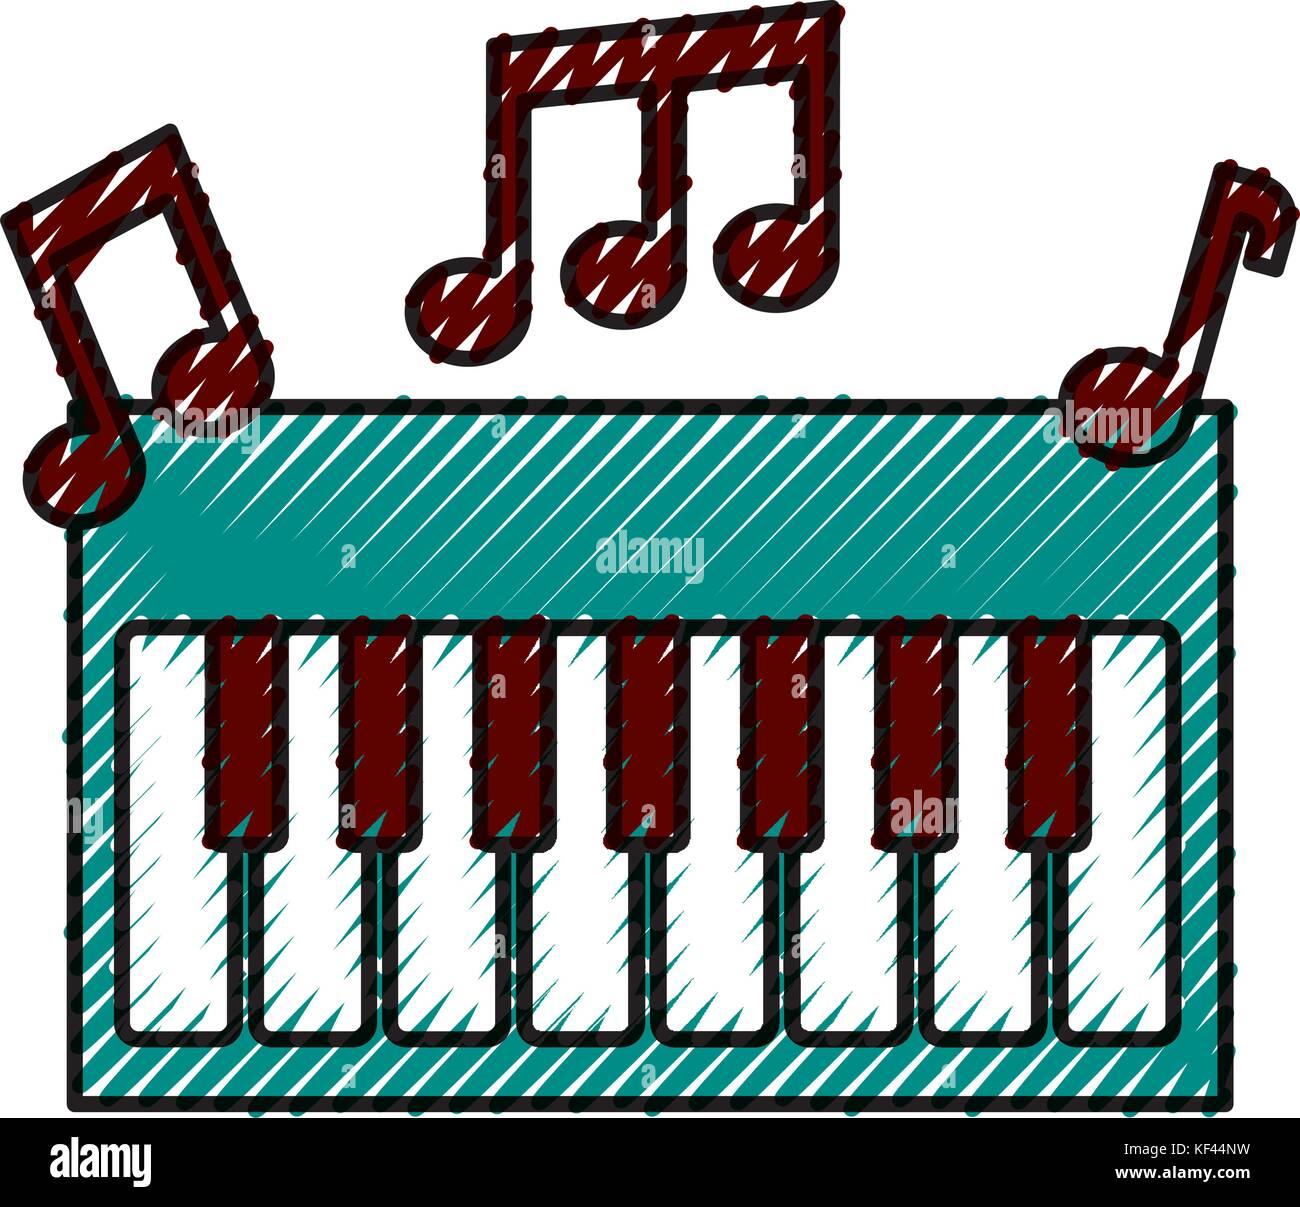 synthesizer note music electronic instrument keyboard - Stock Image